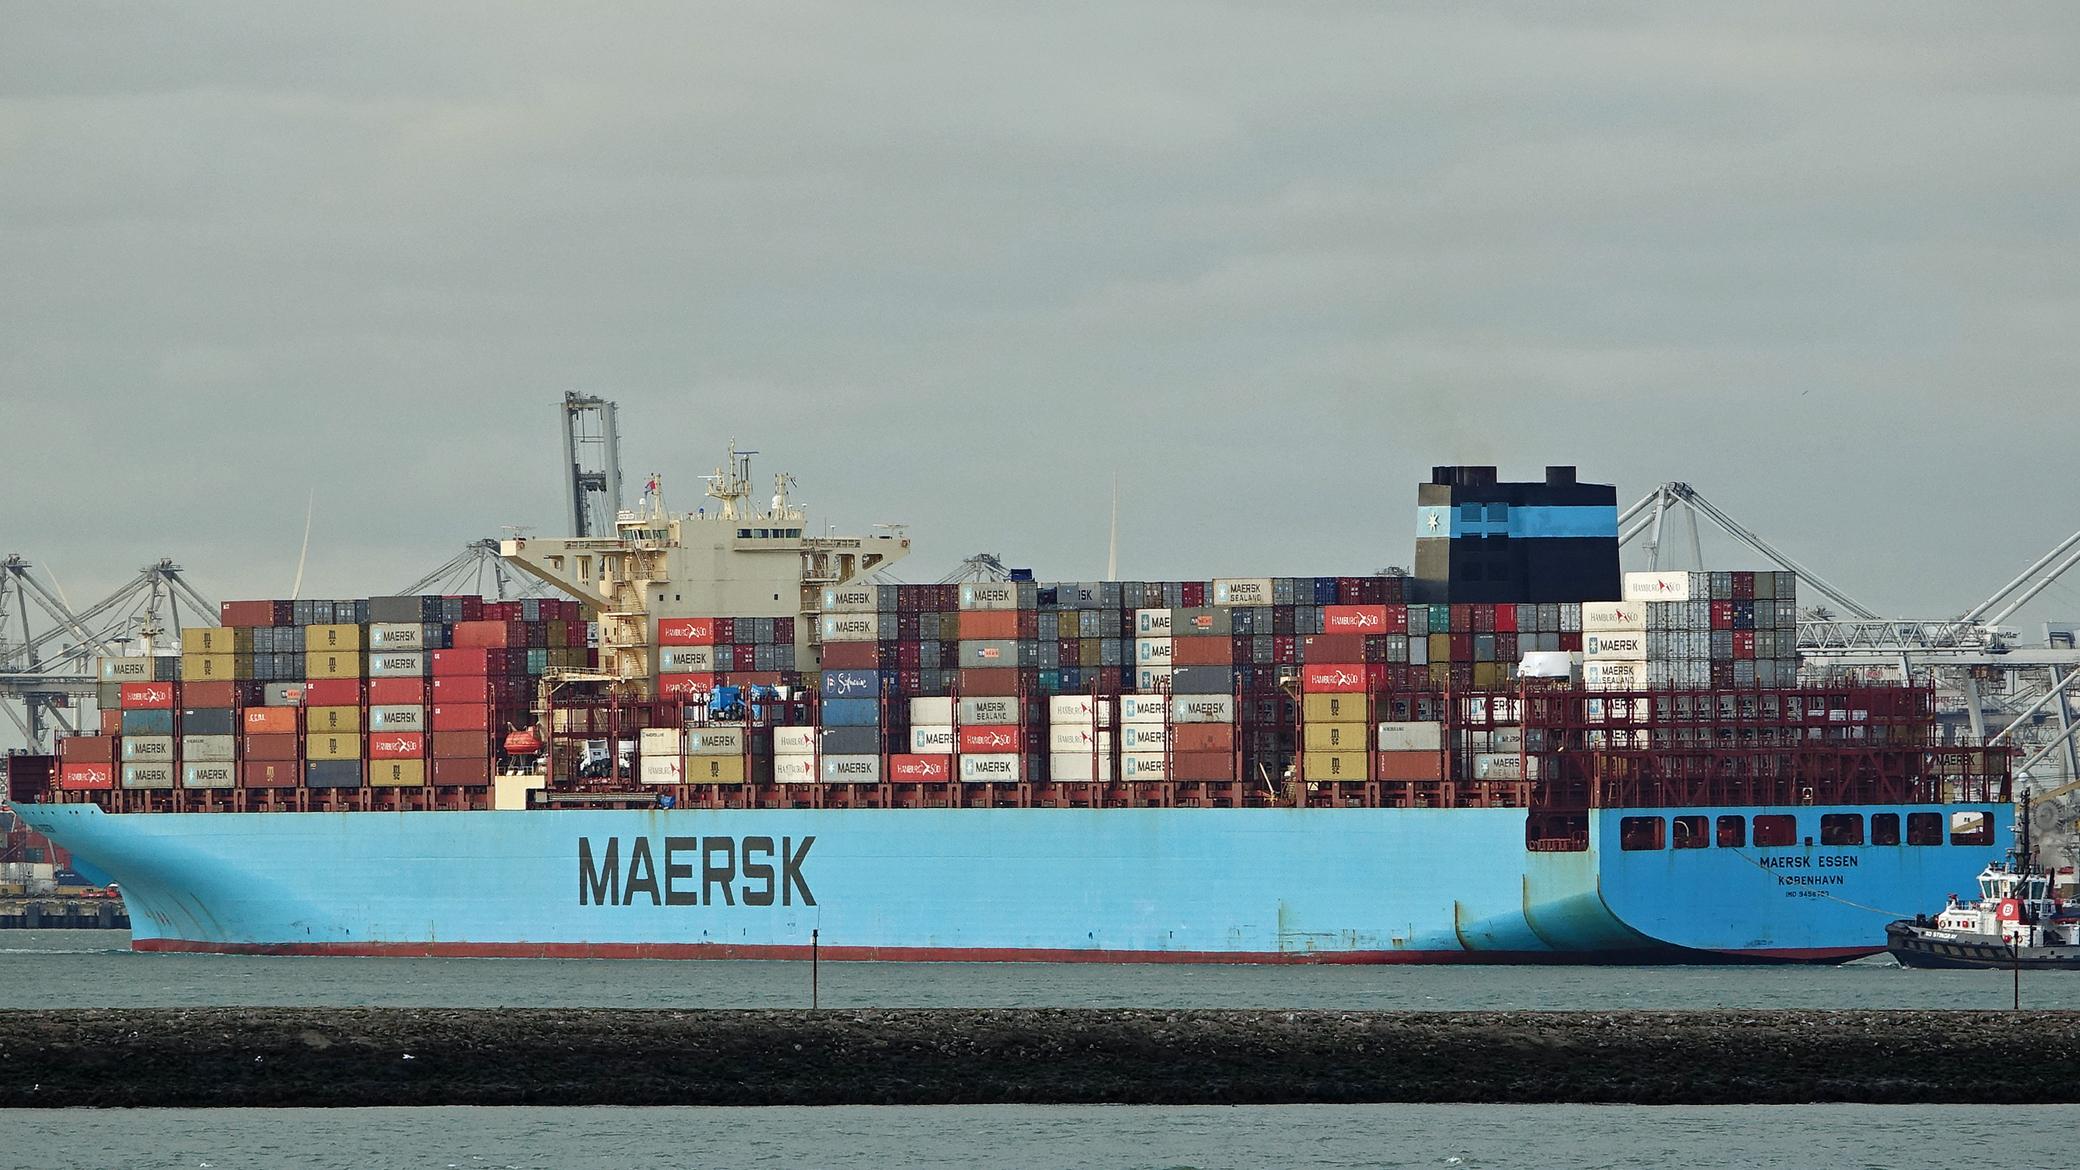 Maersk Essen arrives Port of Lazaro Cardenas, Mexico